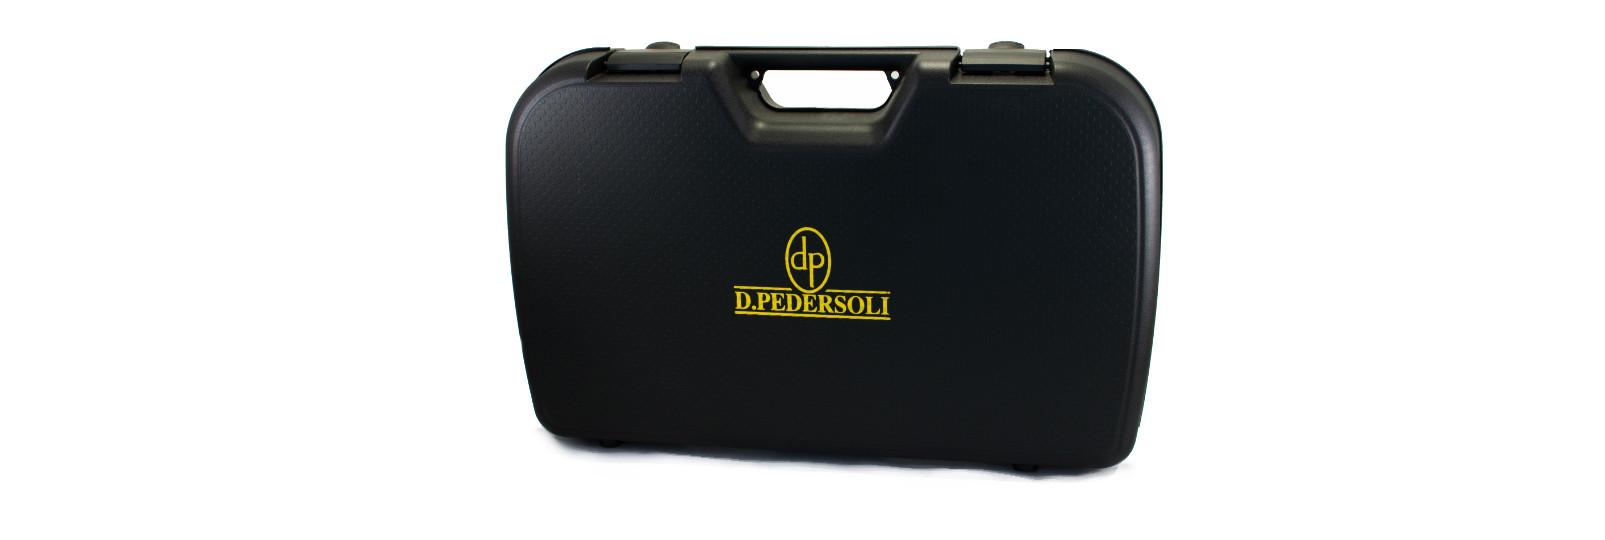 Standard pistol case